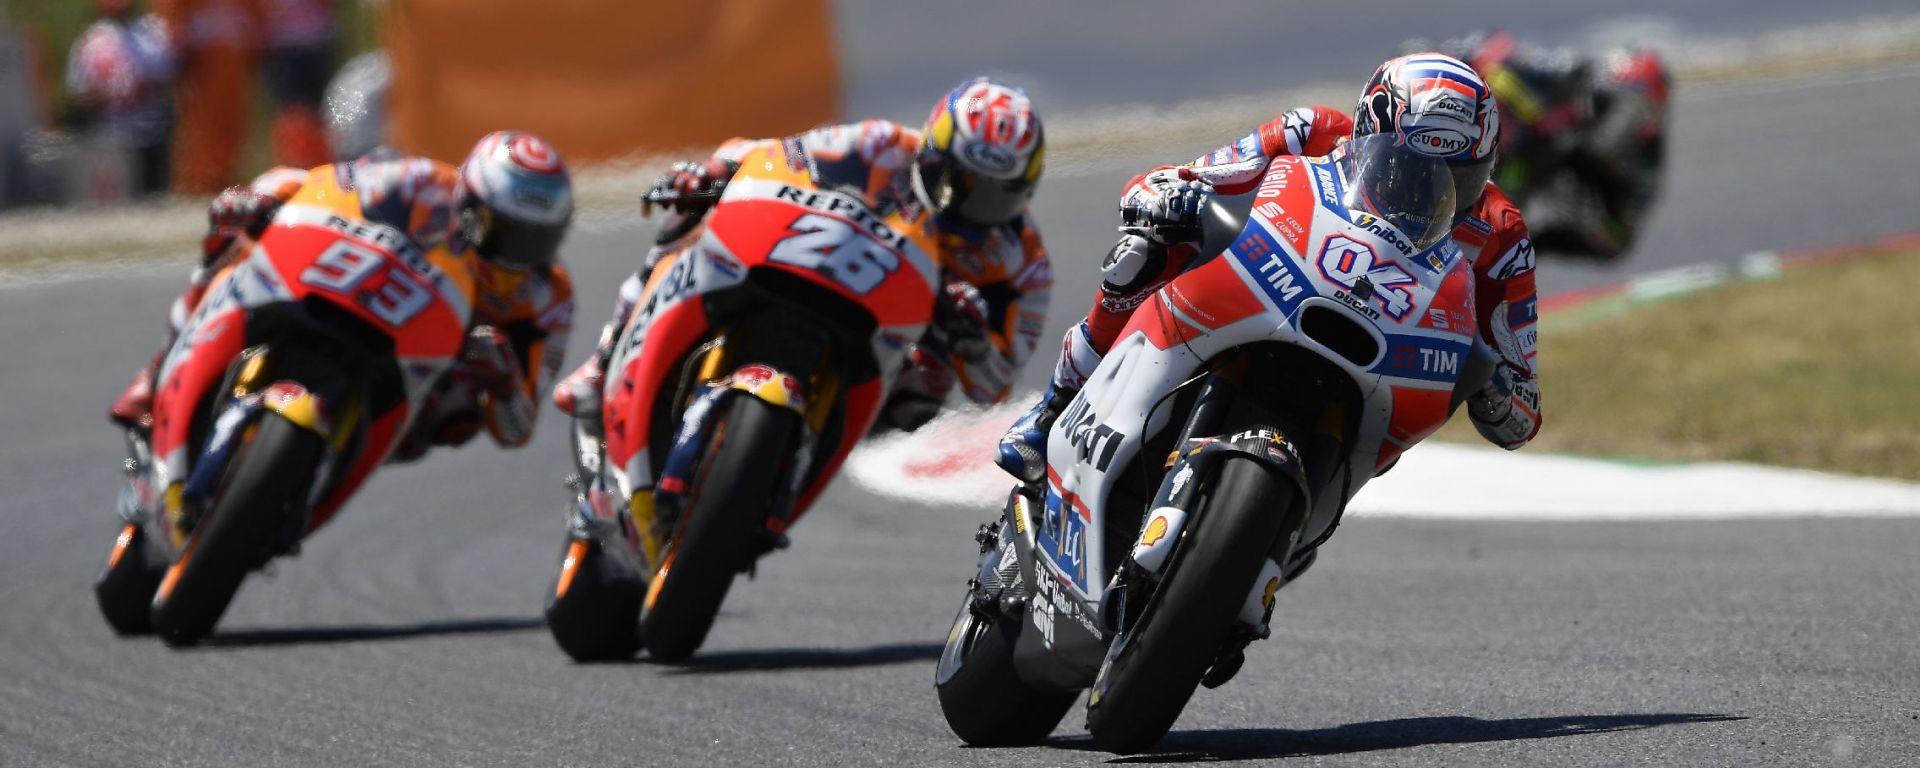 MotoGP Catalunya 2017: le pagelle di Barcellona